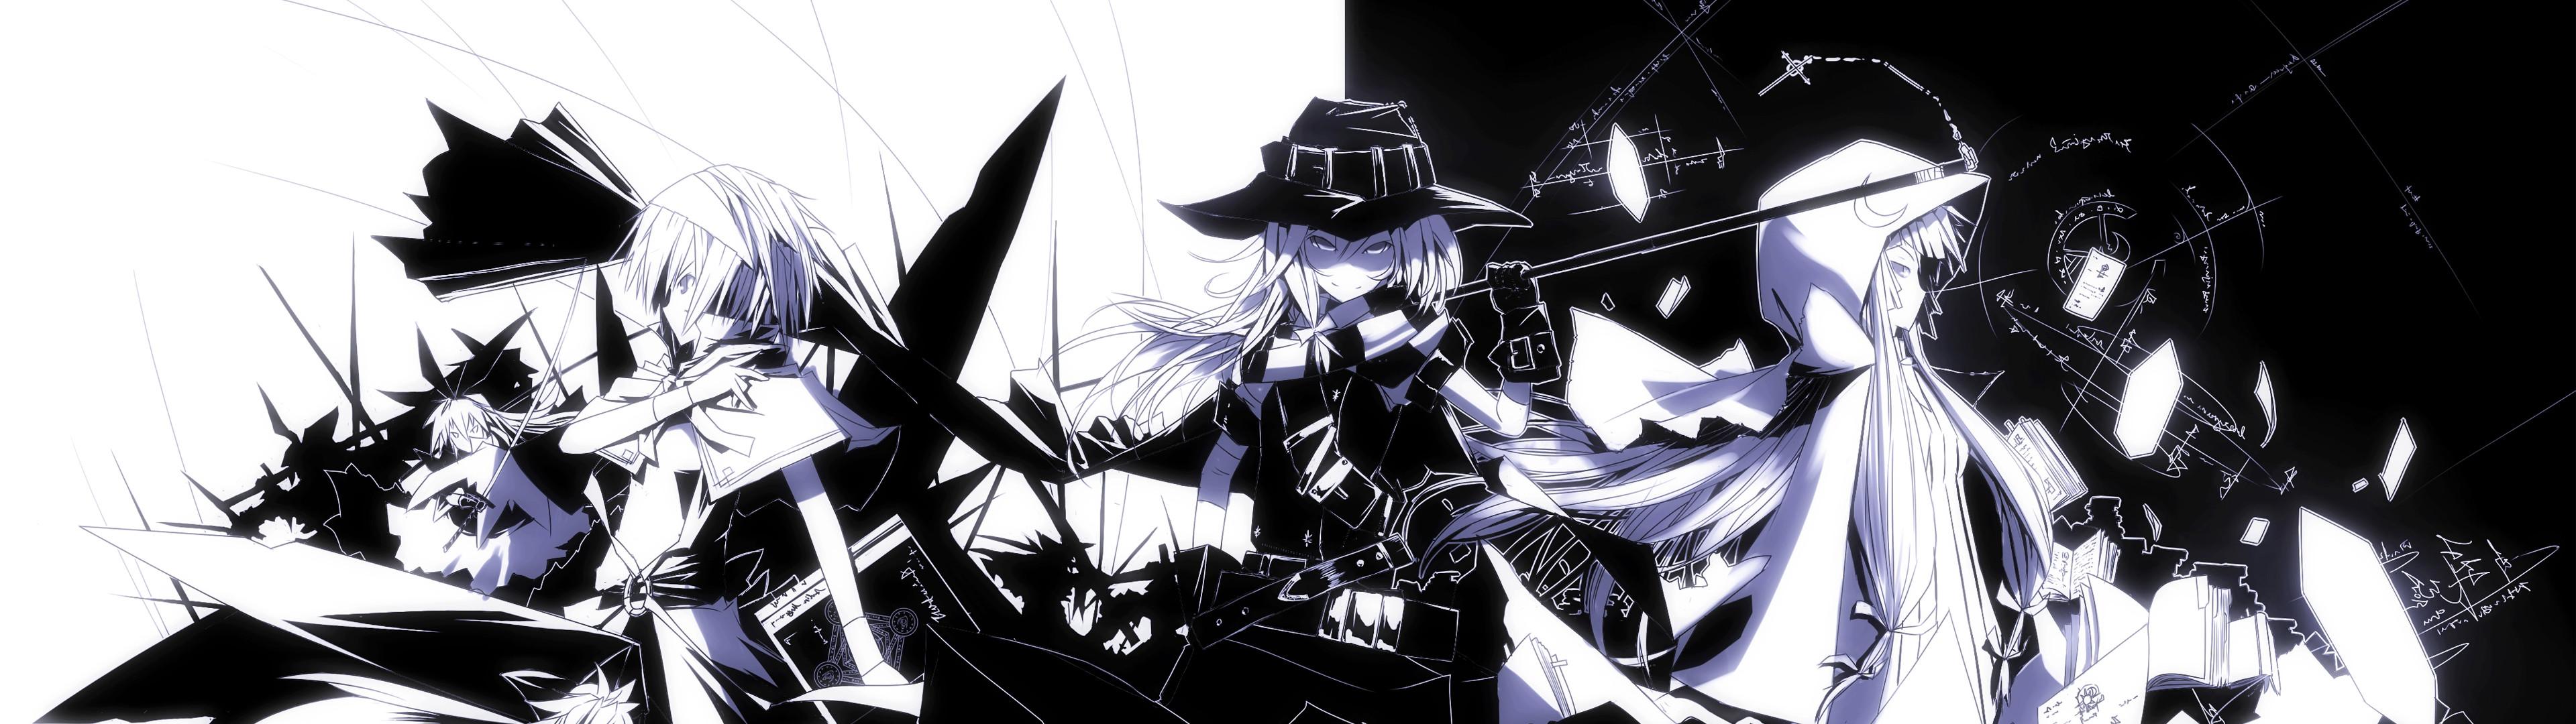 Anime Computer Wallpapers, Desktop Backgrounds     ID:401906